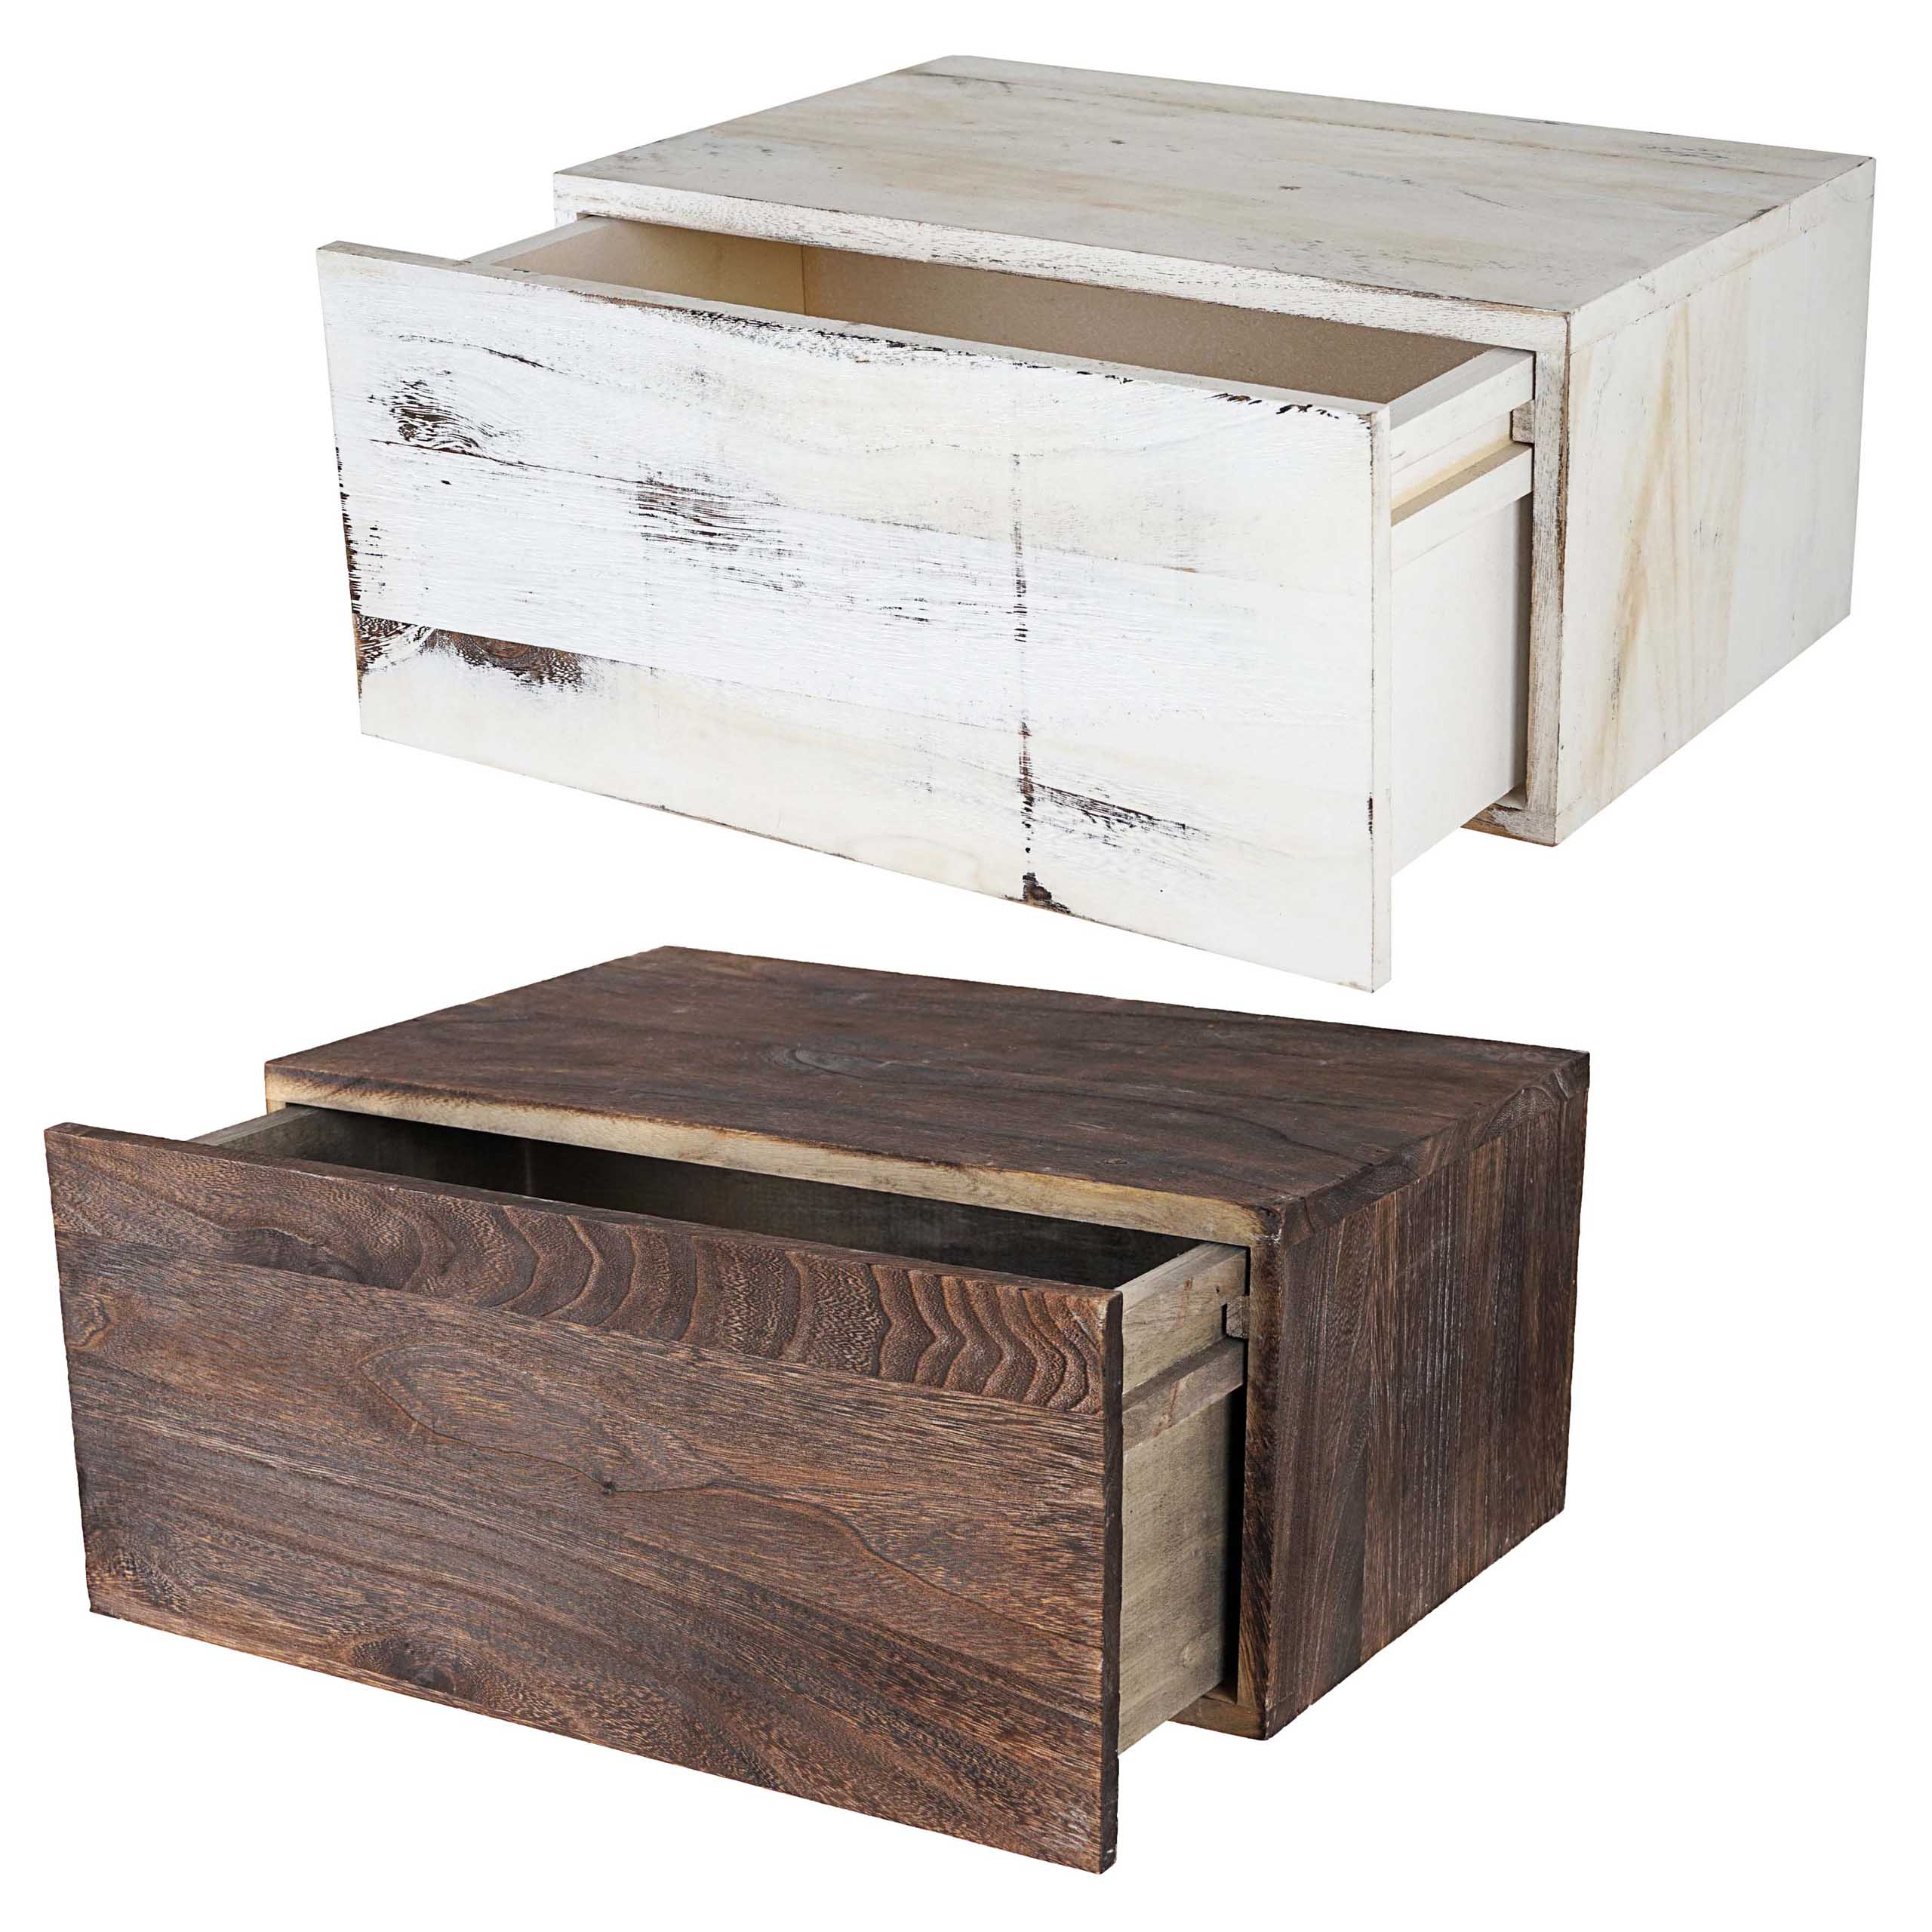 wandregal dinant schubladen regal shabby look vintage 21x46x30cm ebay. Black Bedroom Furniture Sets. Home Design Ideas